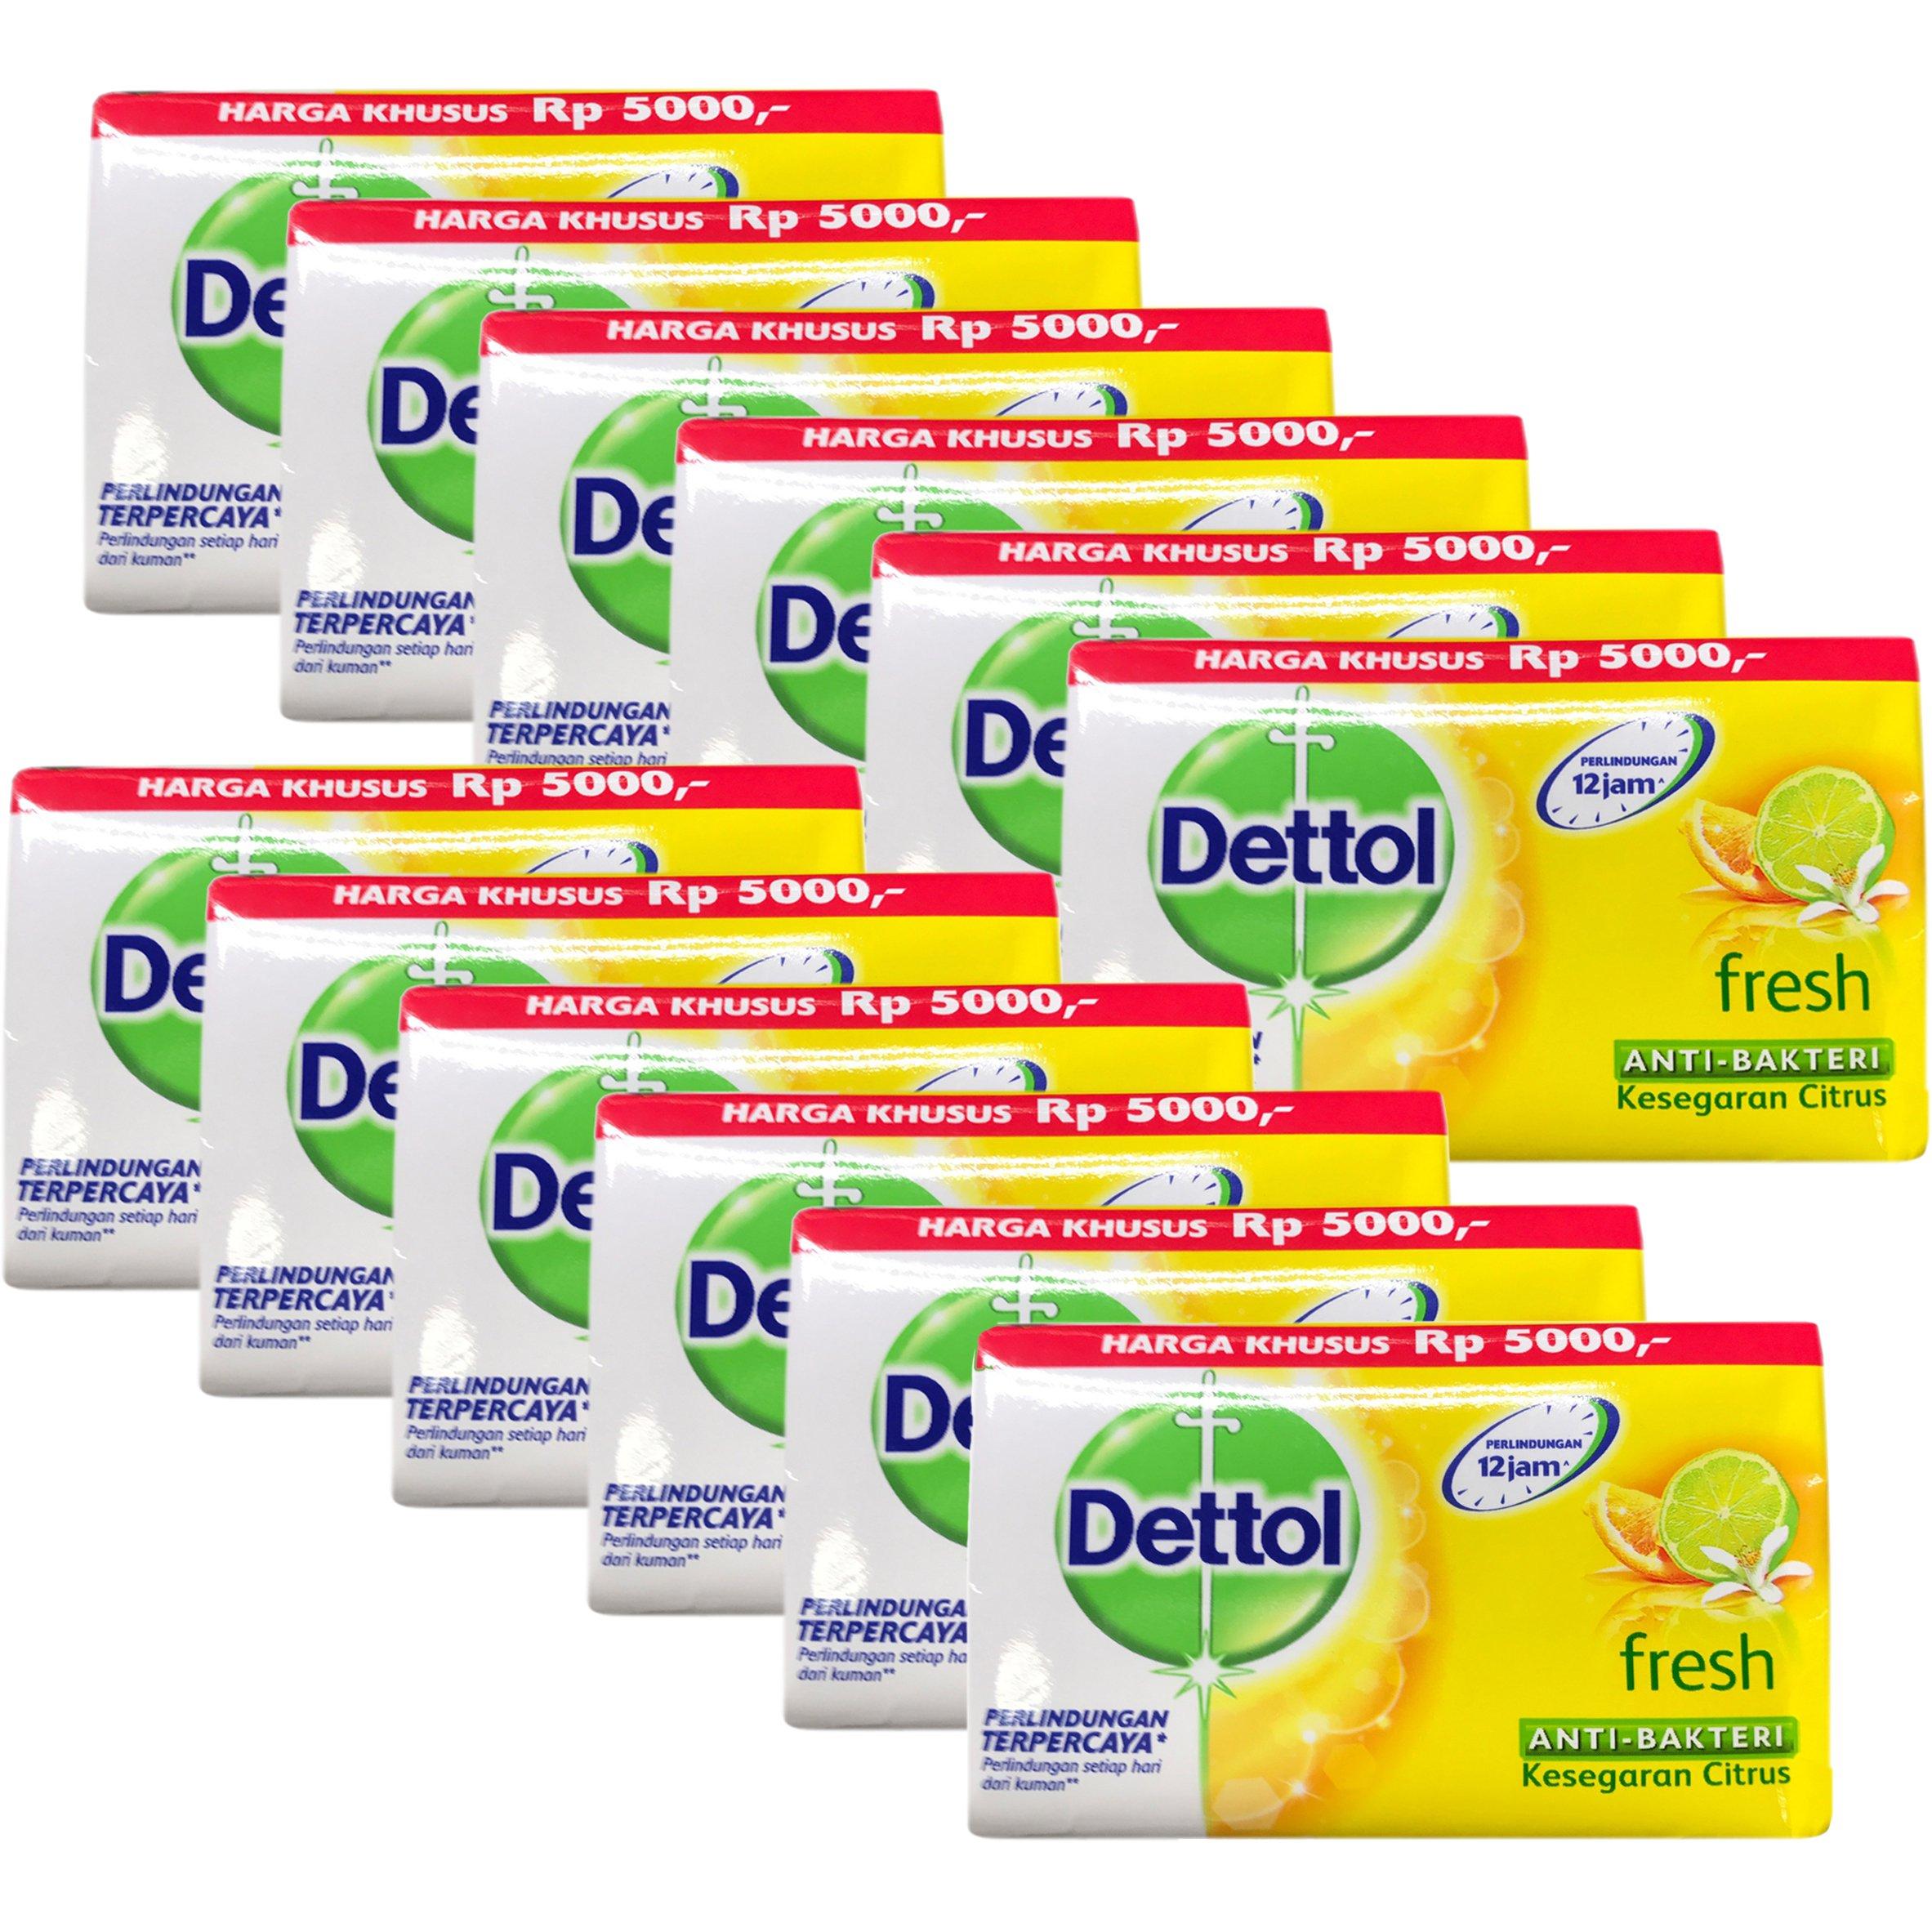 Dettol Anti-Bacterial Bar Soap, Re-Energize Fresh, 110 Gr / 3.88 Oz (Pack of 12)